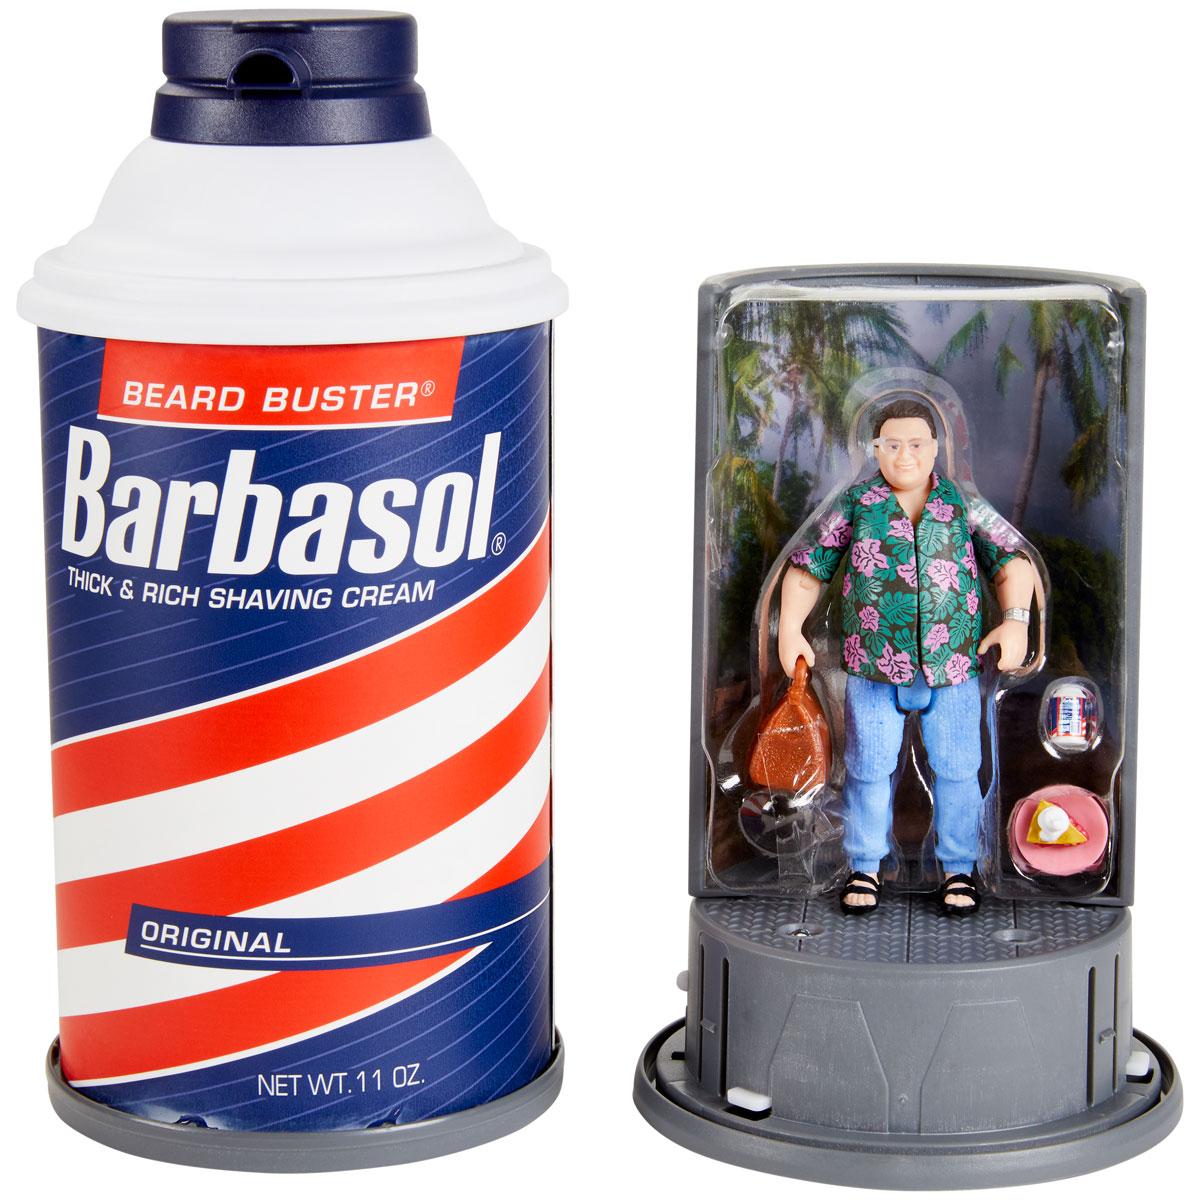 Jurassic Park Barbasol Dennis Nedry figurine San Diego comic-con 2020 Convention Exclusive